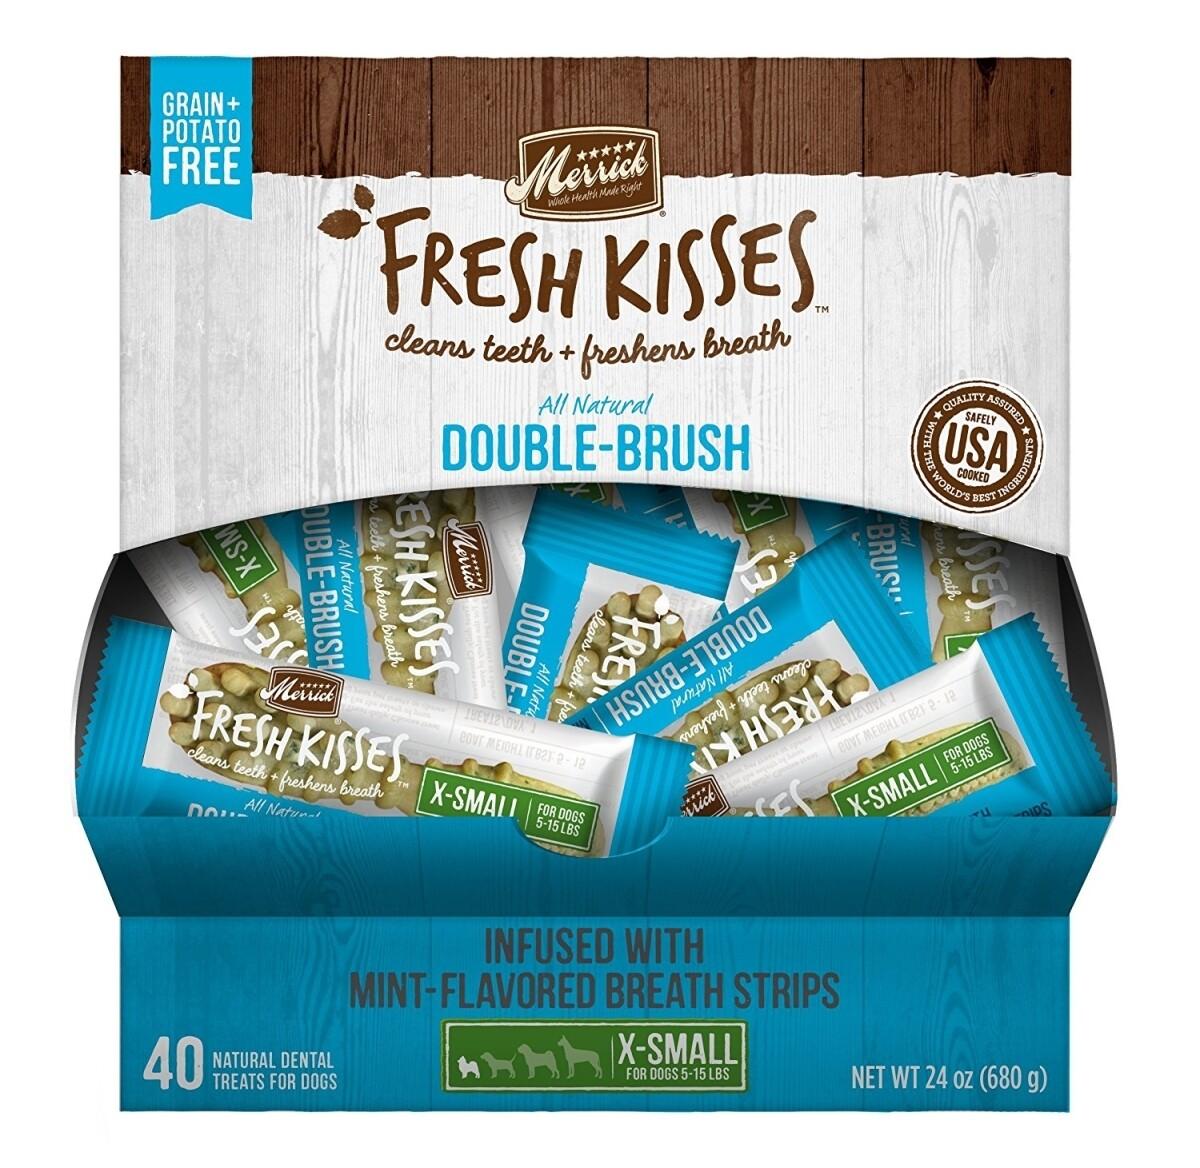 **BOGO** Merrick Fresh Kisses Mint Breath Strips Extra Small Dental Dog Treat - 40 Count #66036 (1/19) (A.L4)